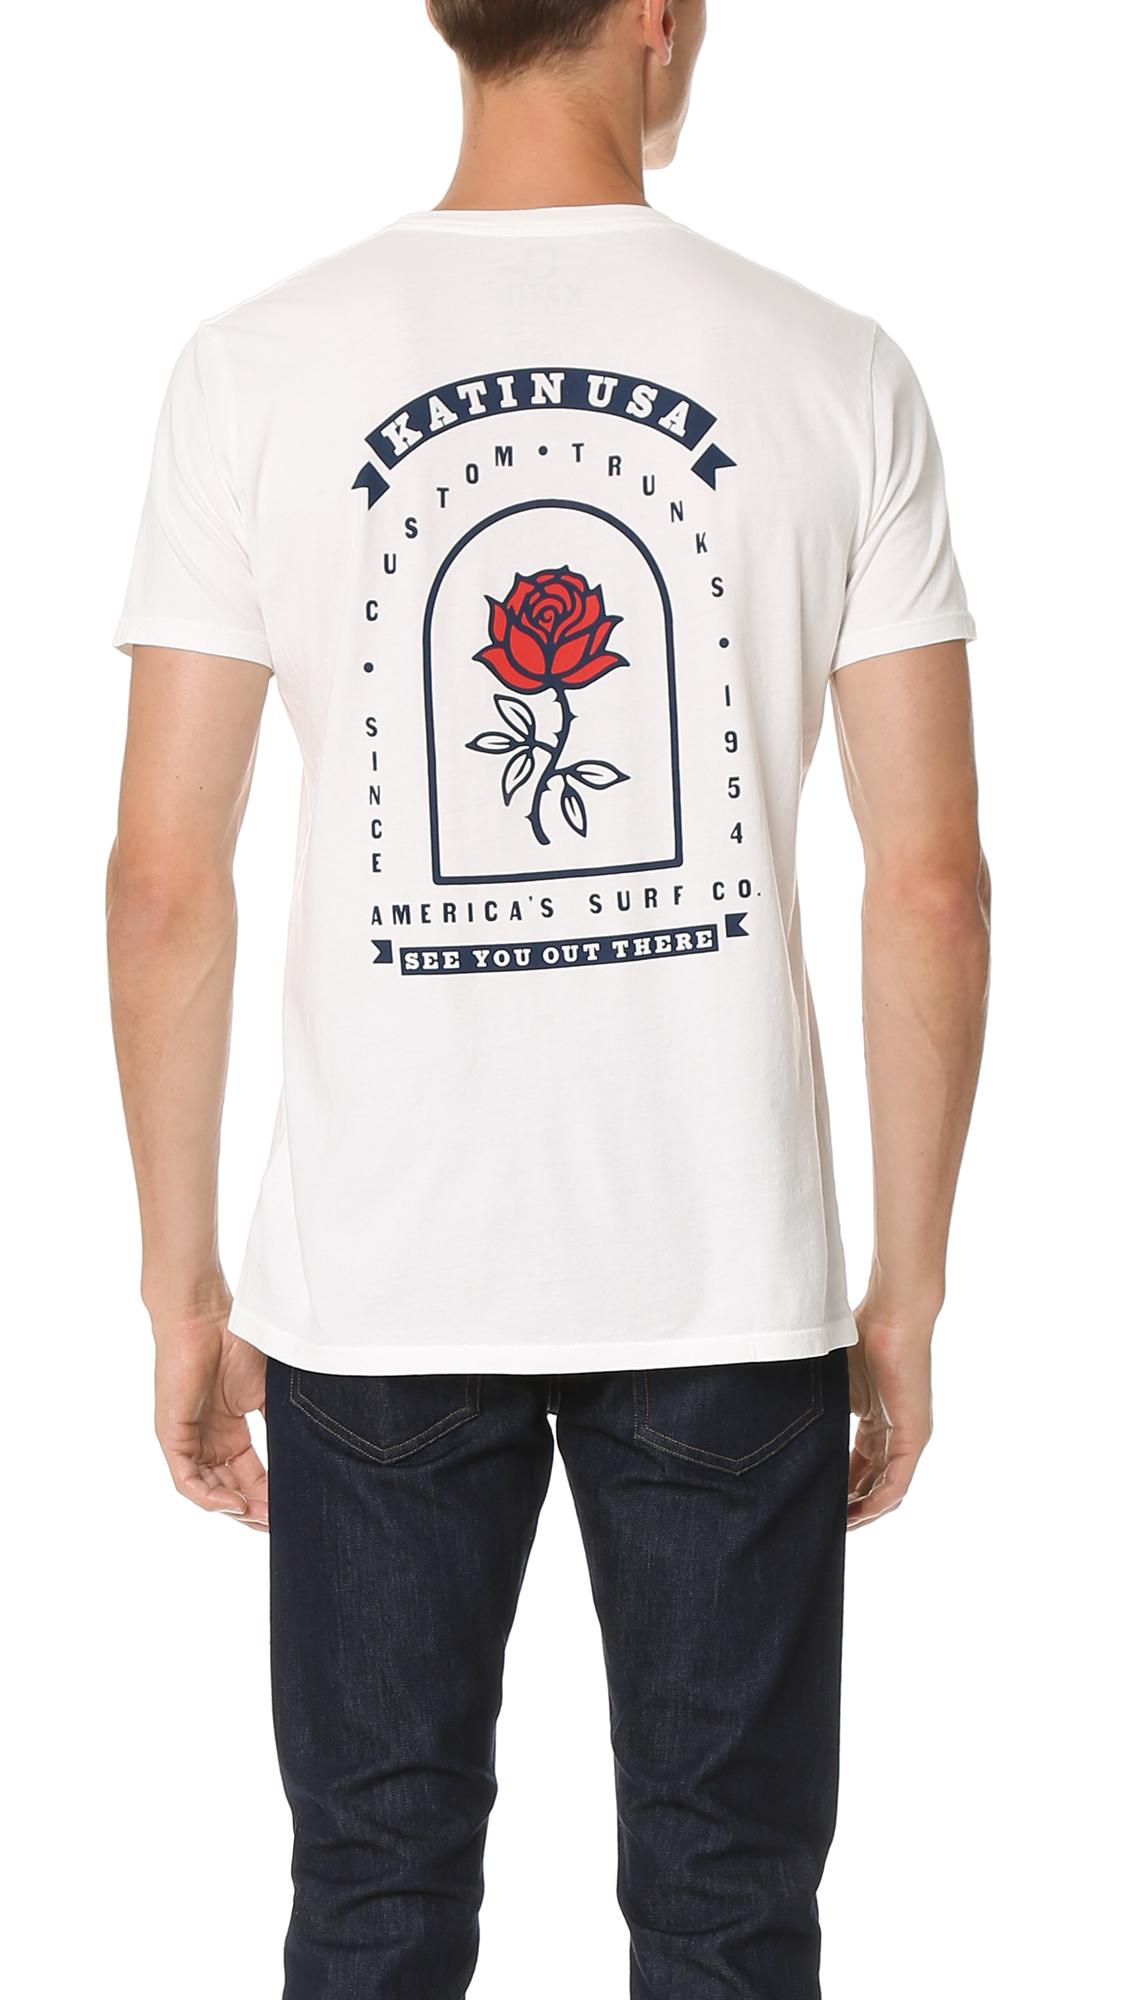 40505054714 Graphic Sweatshirts For Guys - BCD Tofu House